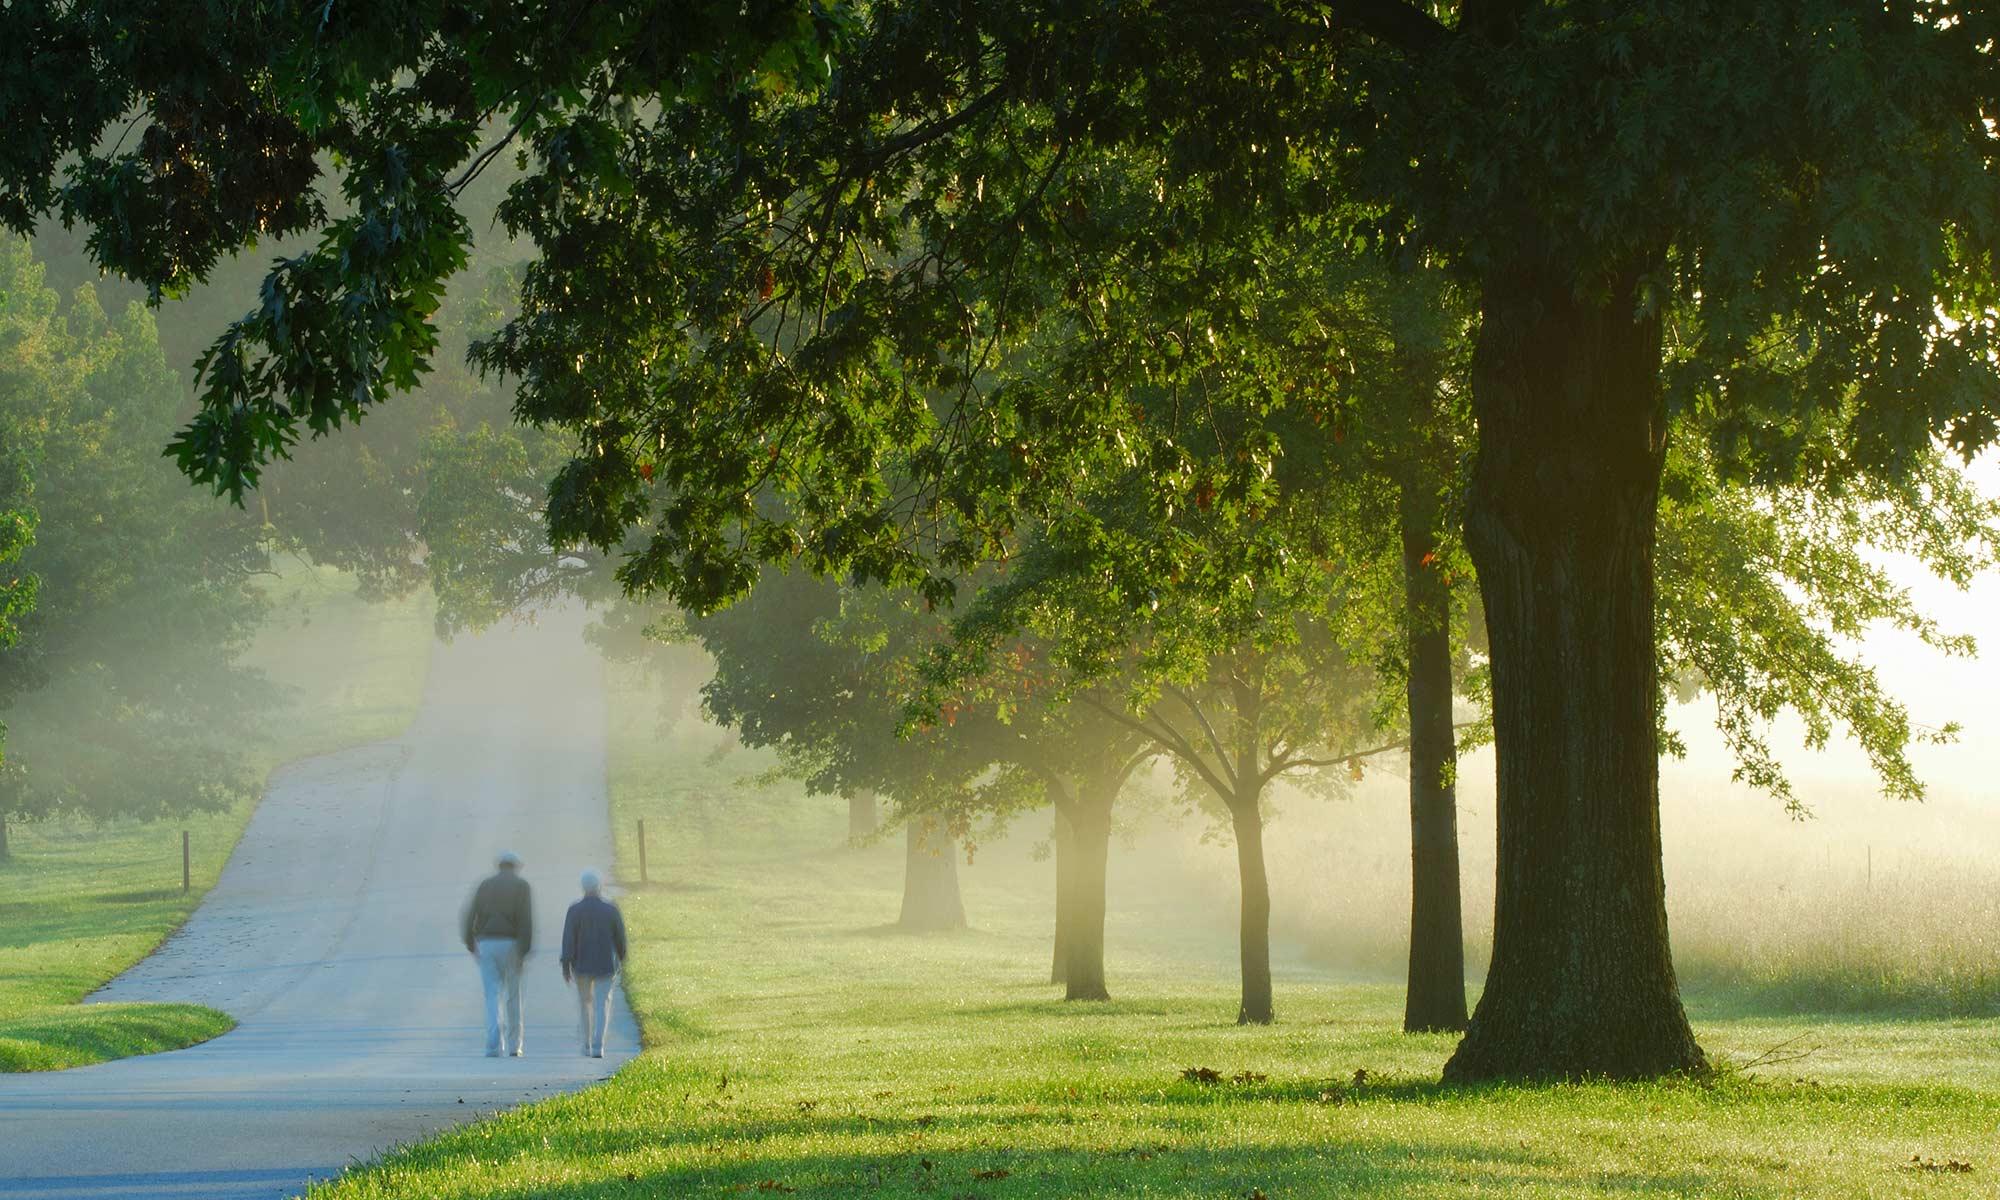 Senior living residents walking down a road next to a grassy field near Kephart Plaza